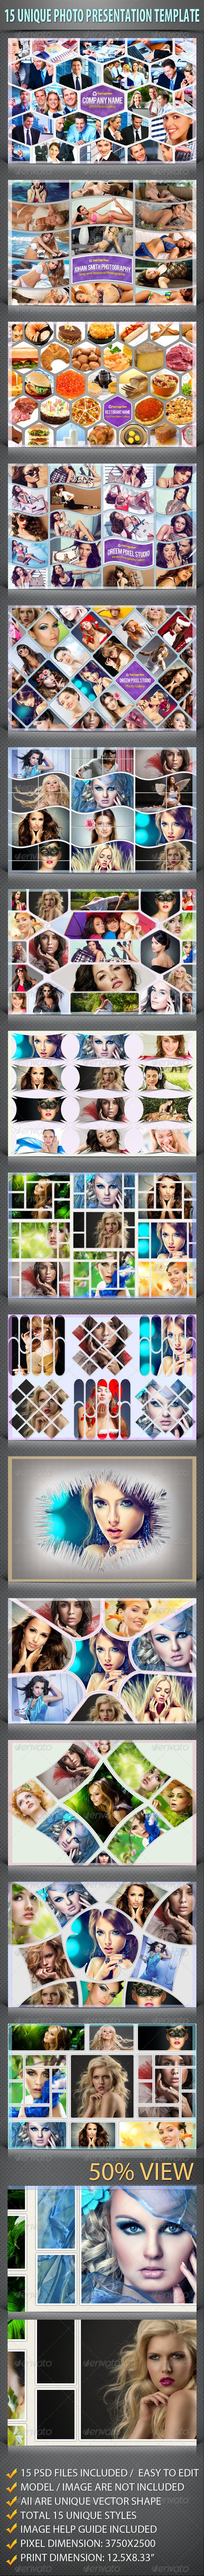 15 Unique Photo Presentation Template - Photo Templates Graphics